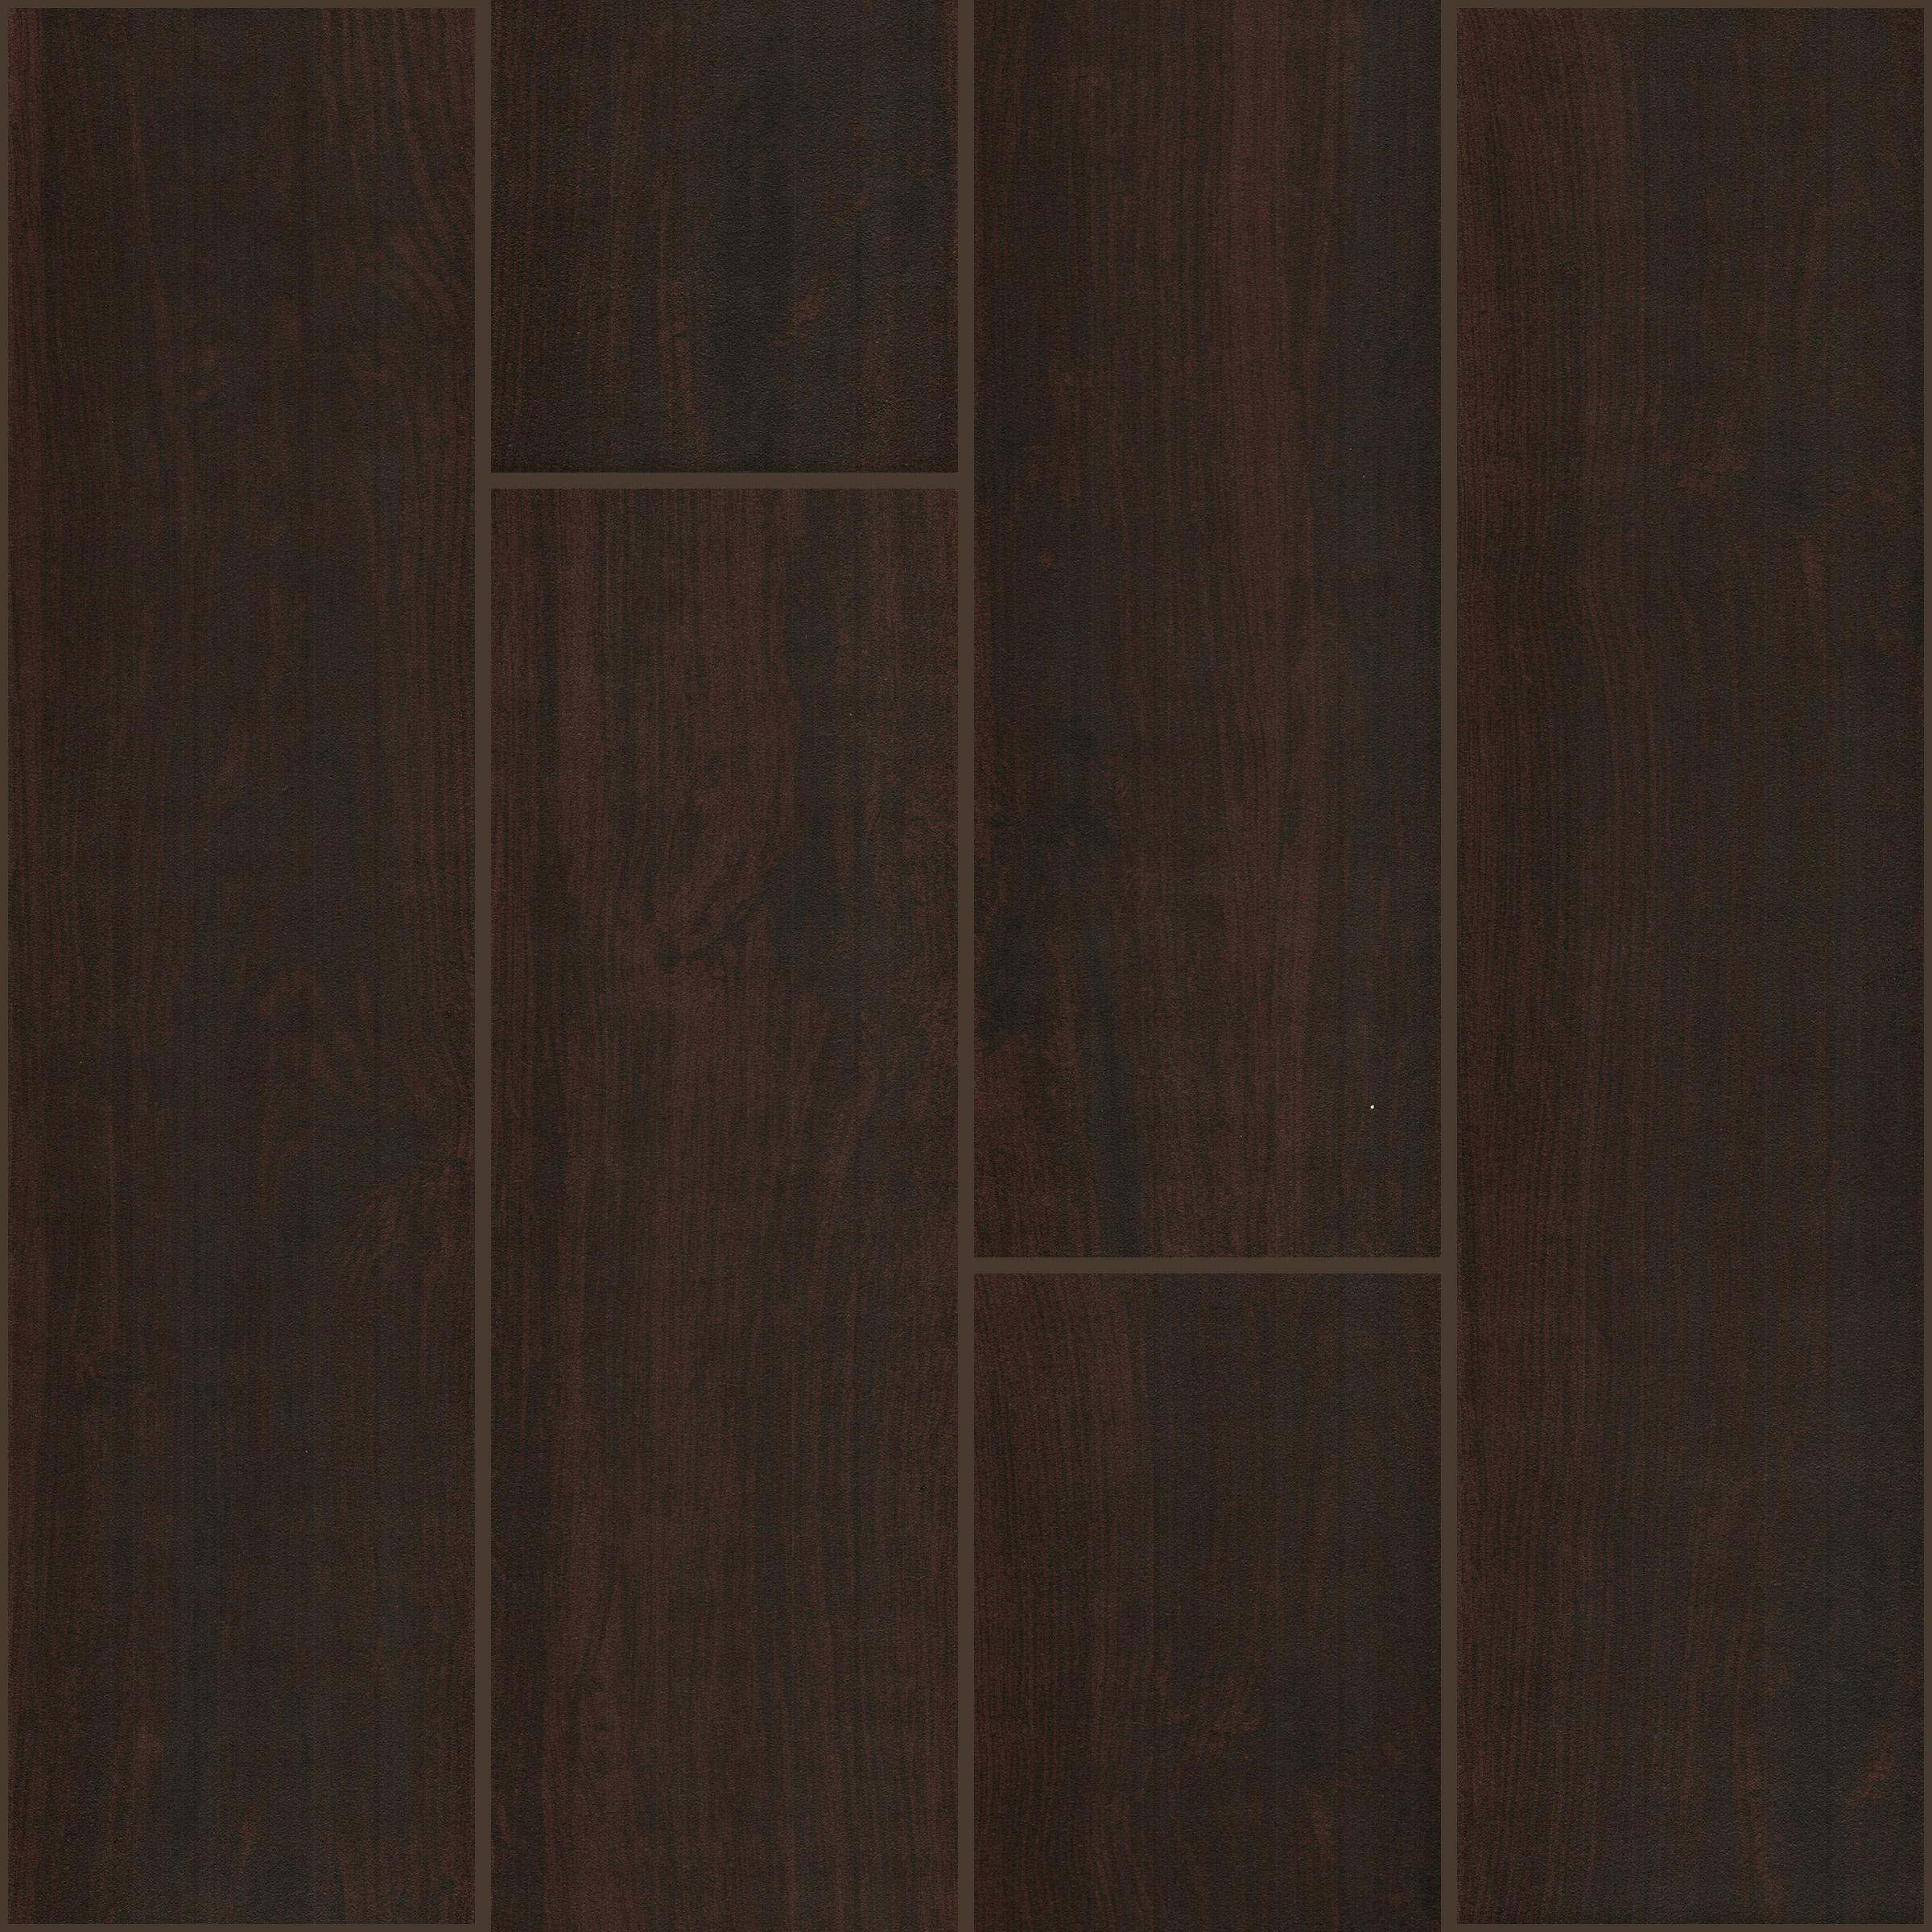 Florim Black Walnut 6 X 24 Wood Look Porcelain Tile Brown